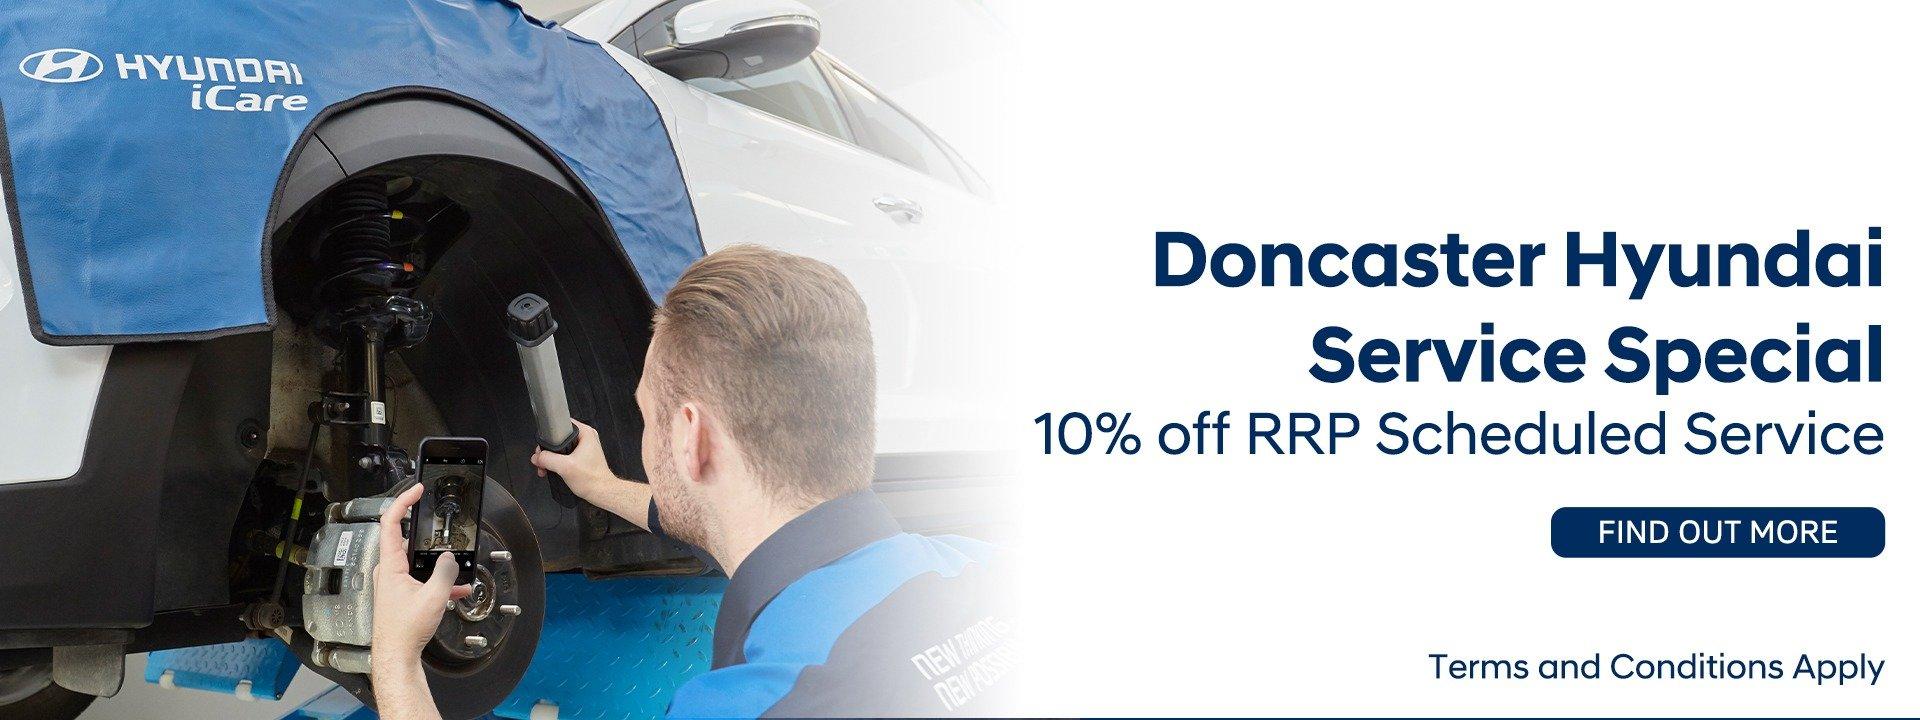 Doncaster Hyundai Service Specials